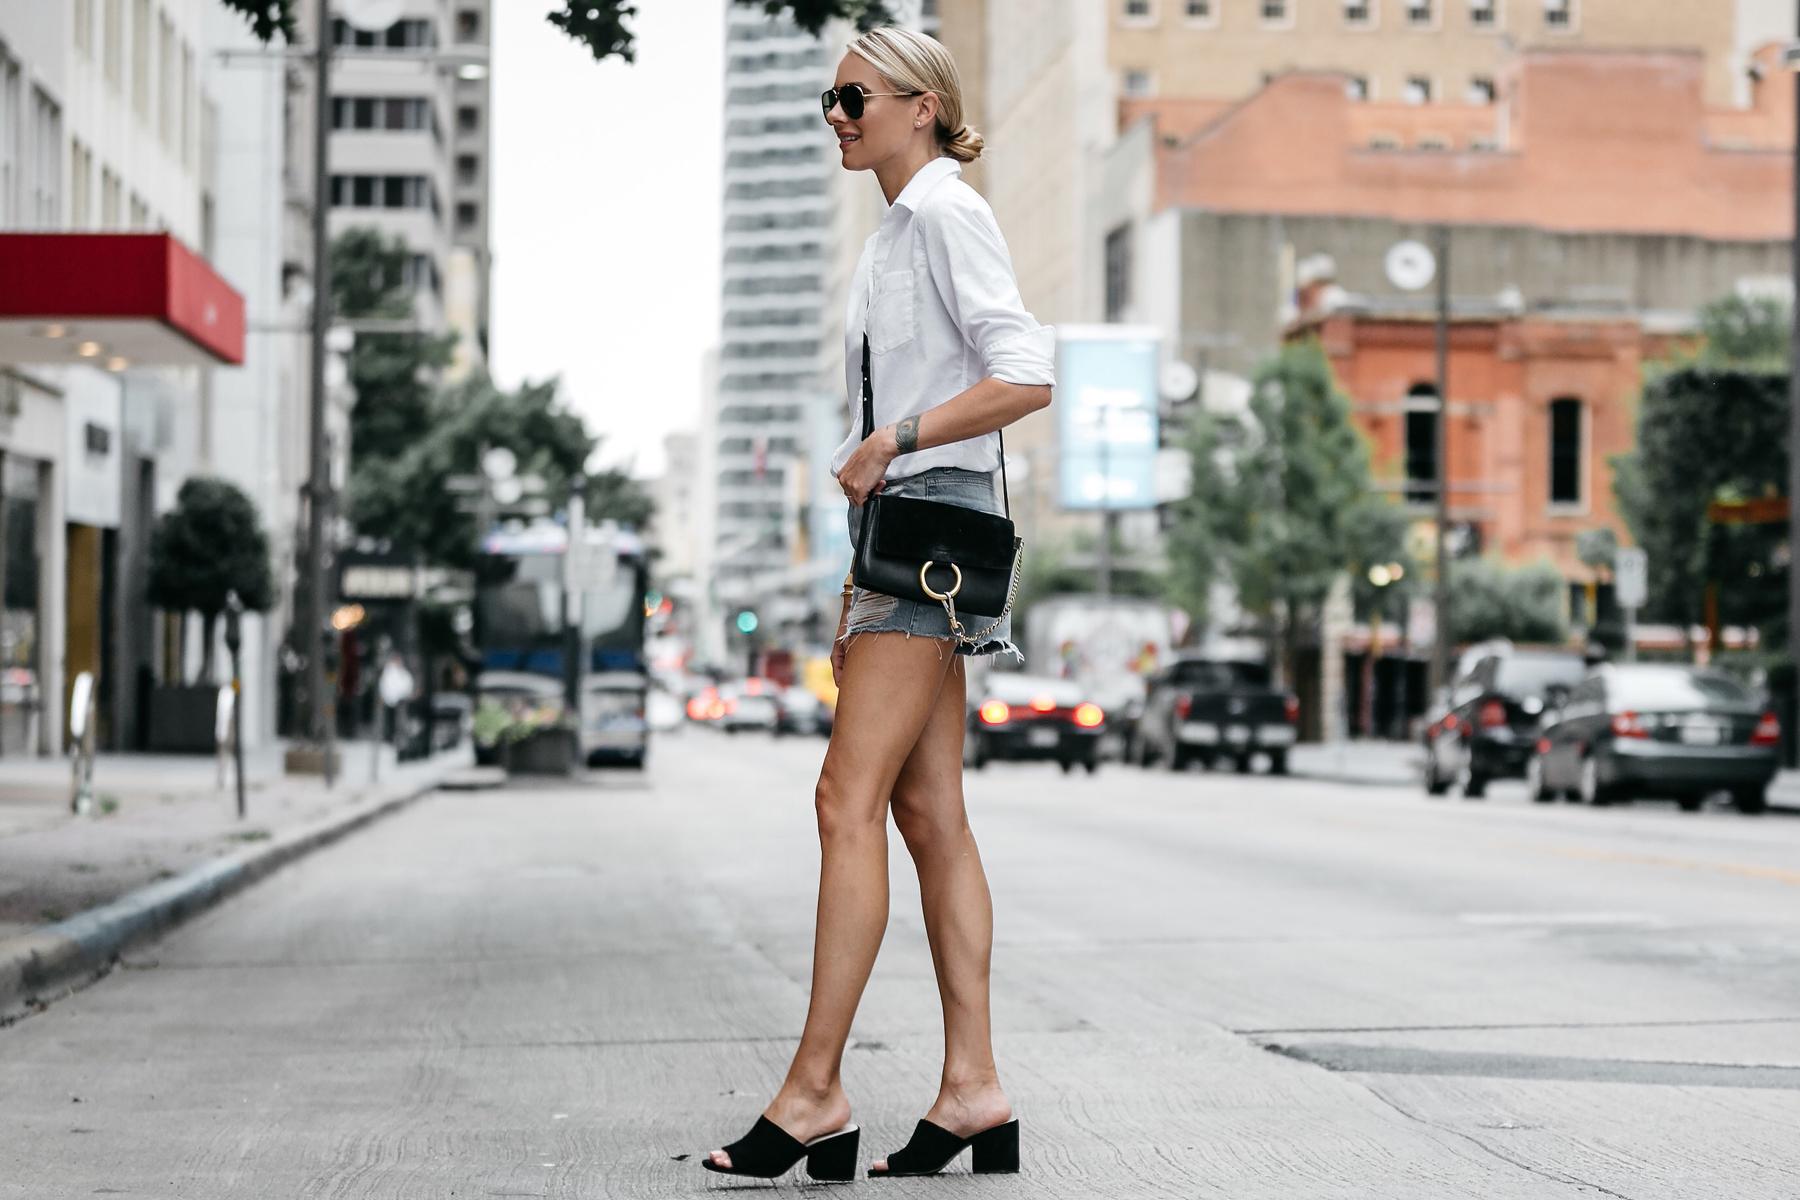 Blonde Woman Wearing Banana Republic White Button Down Shirt Topshop Ripped Denim Cutoff Shorts Outfit Steve Madden Black Mules Chloe Faye Handbag Street Style Dallas Blogger Fashion Blogger Fashion Jackson